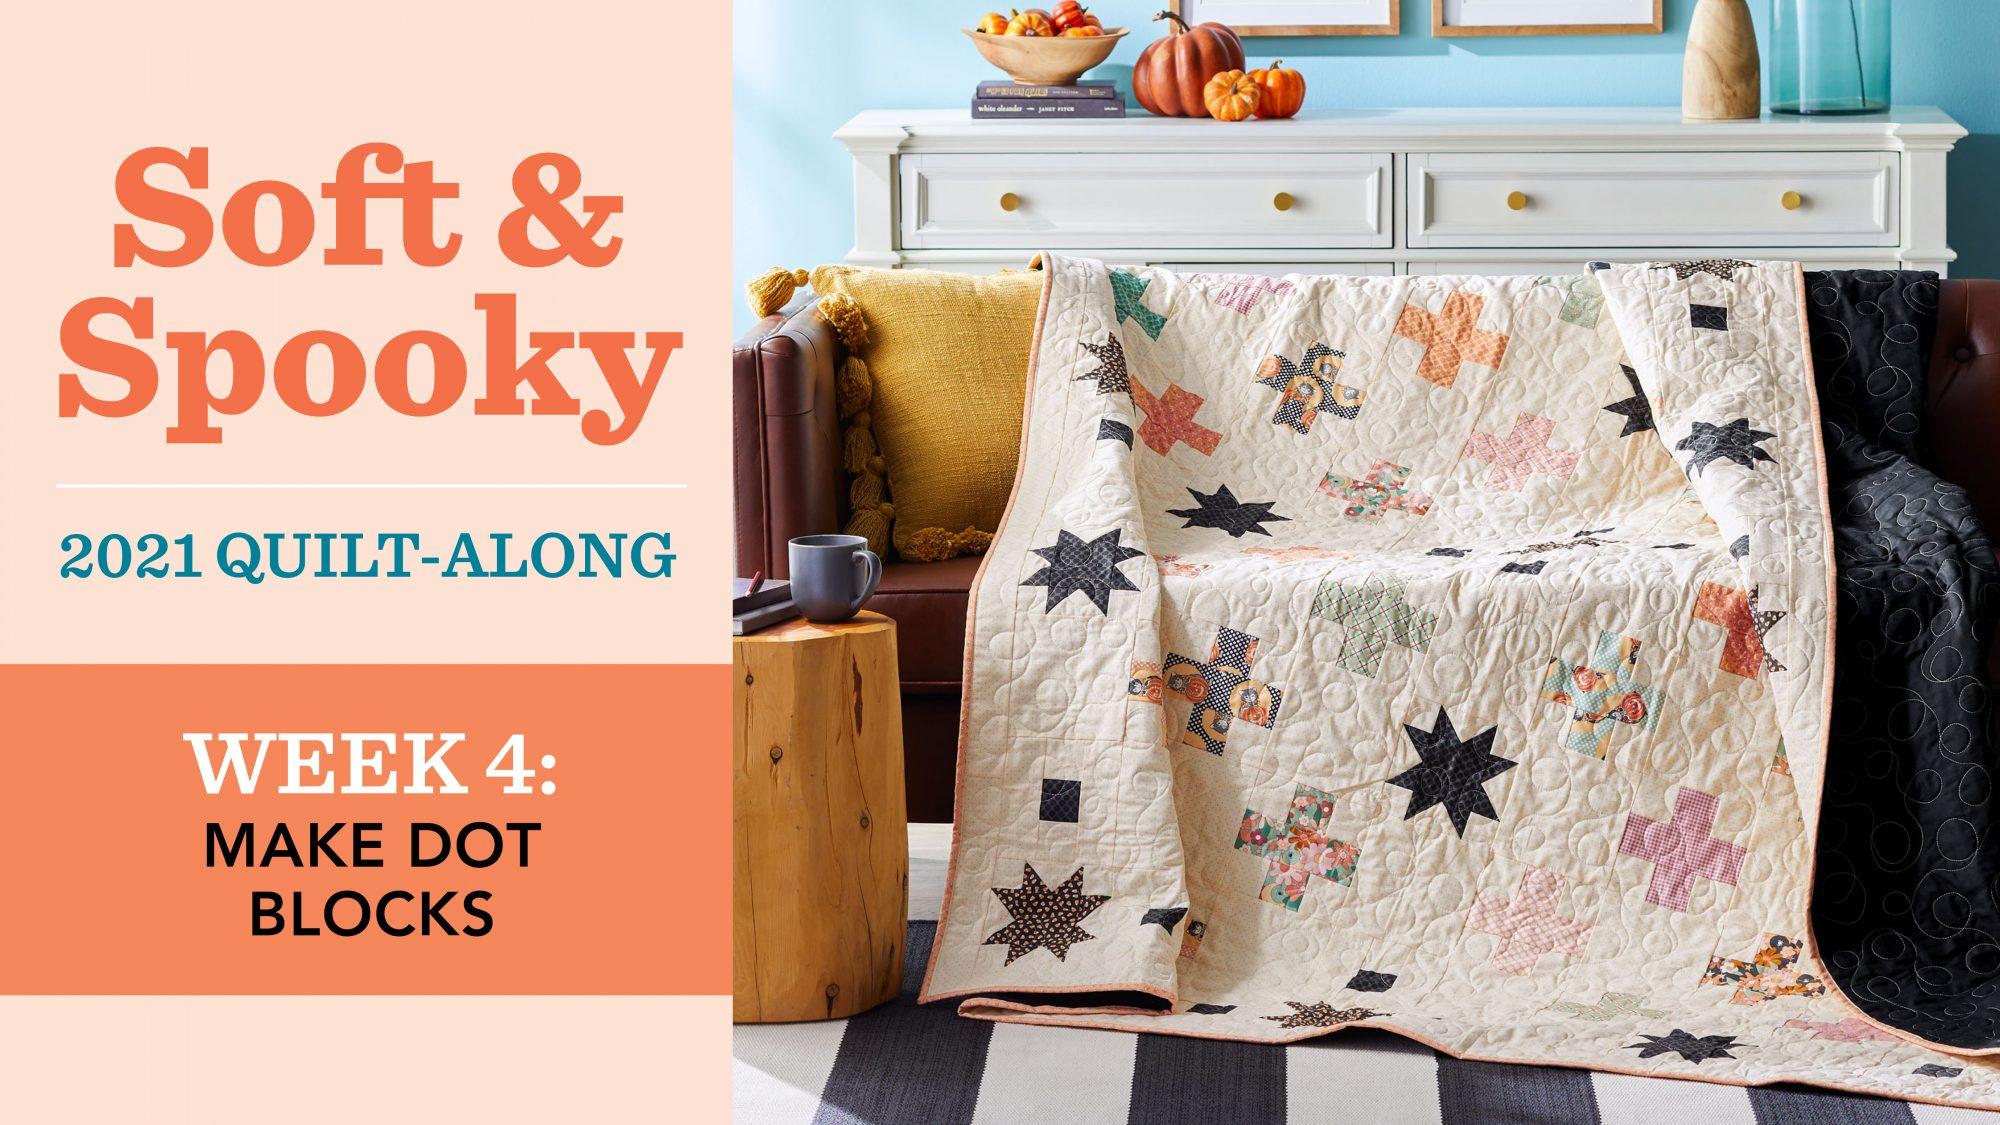 Soft & Spooky Quilt-Along: Week 4